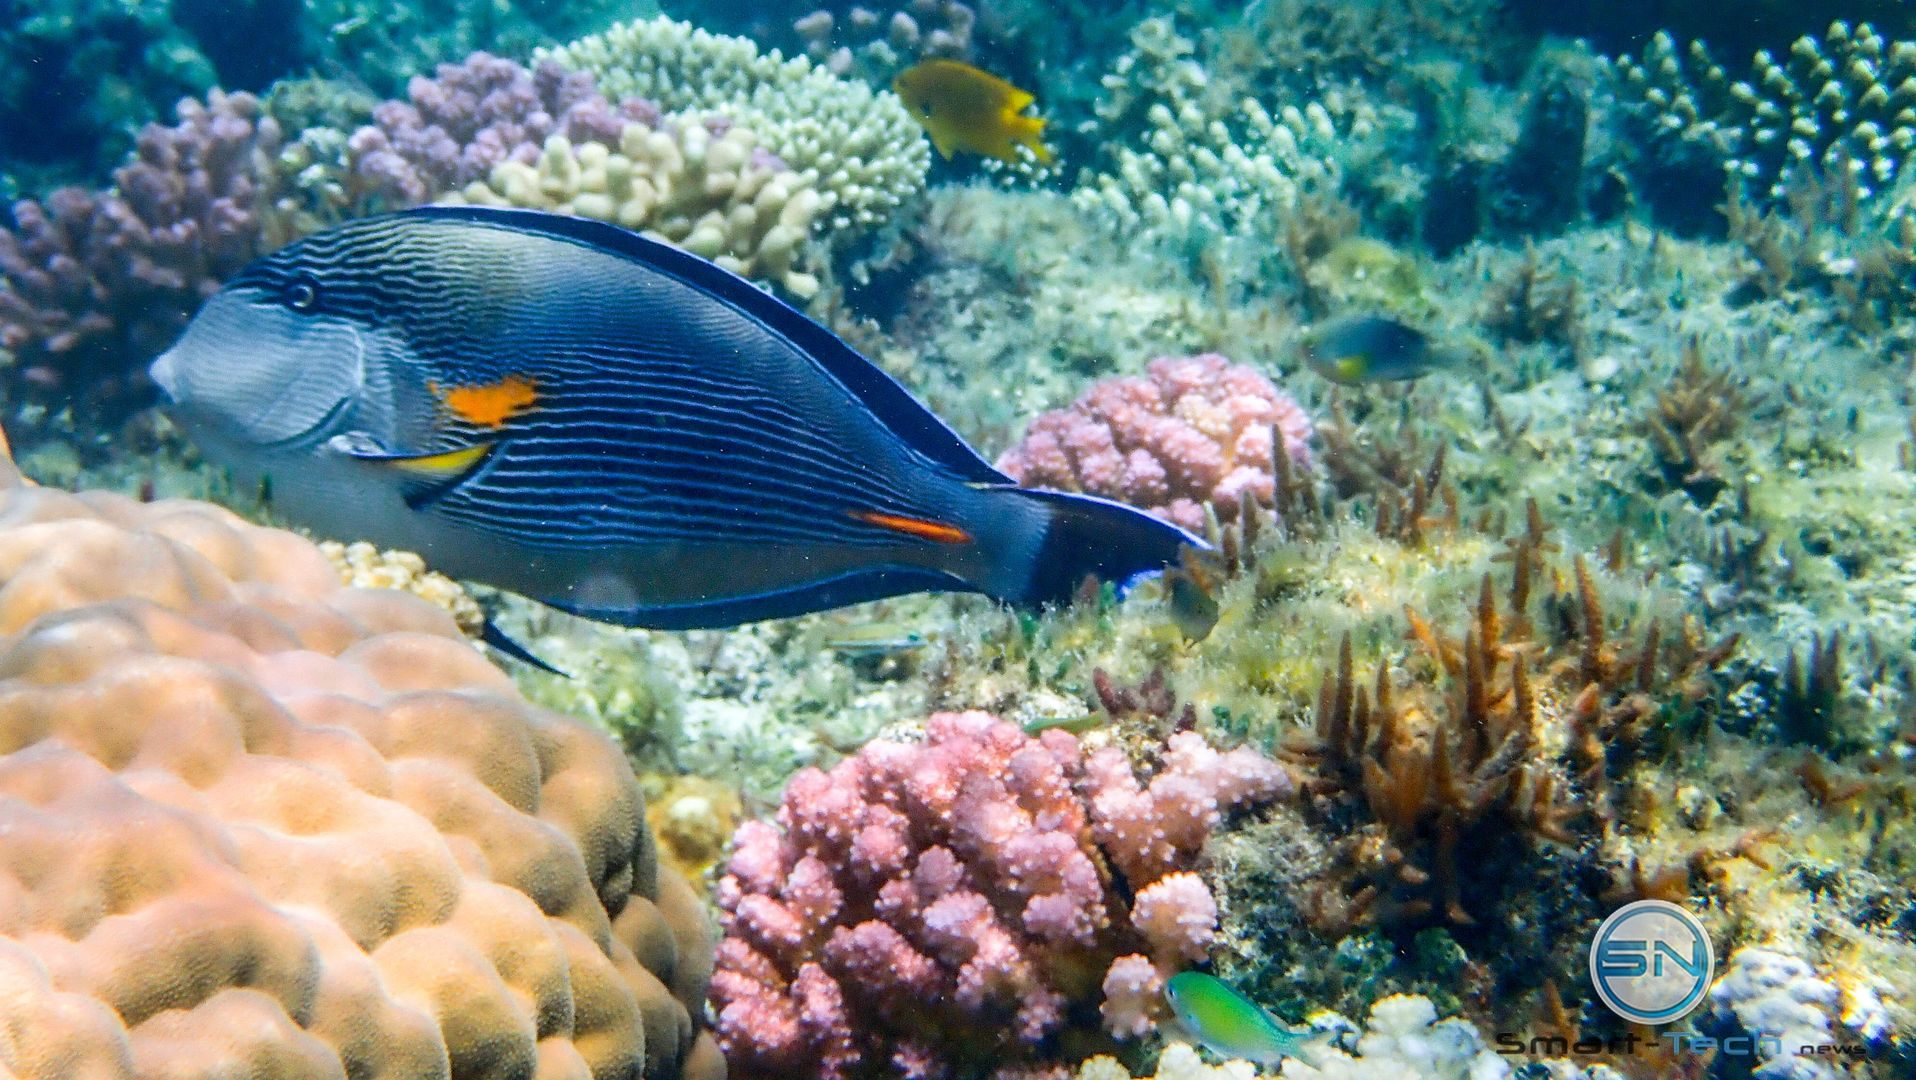 Blue Fish - Egypt - Diving - Olympus TG5